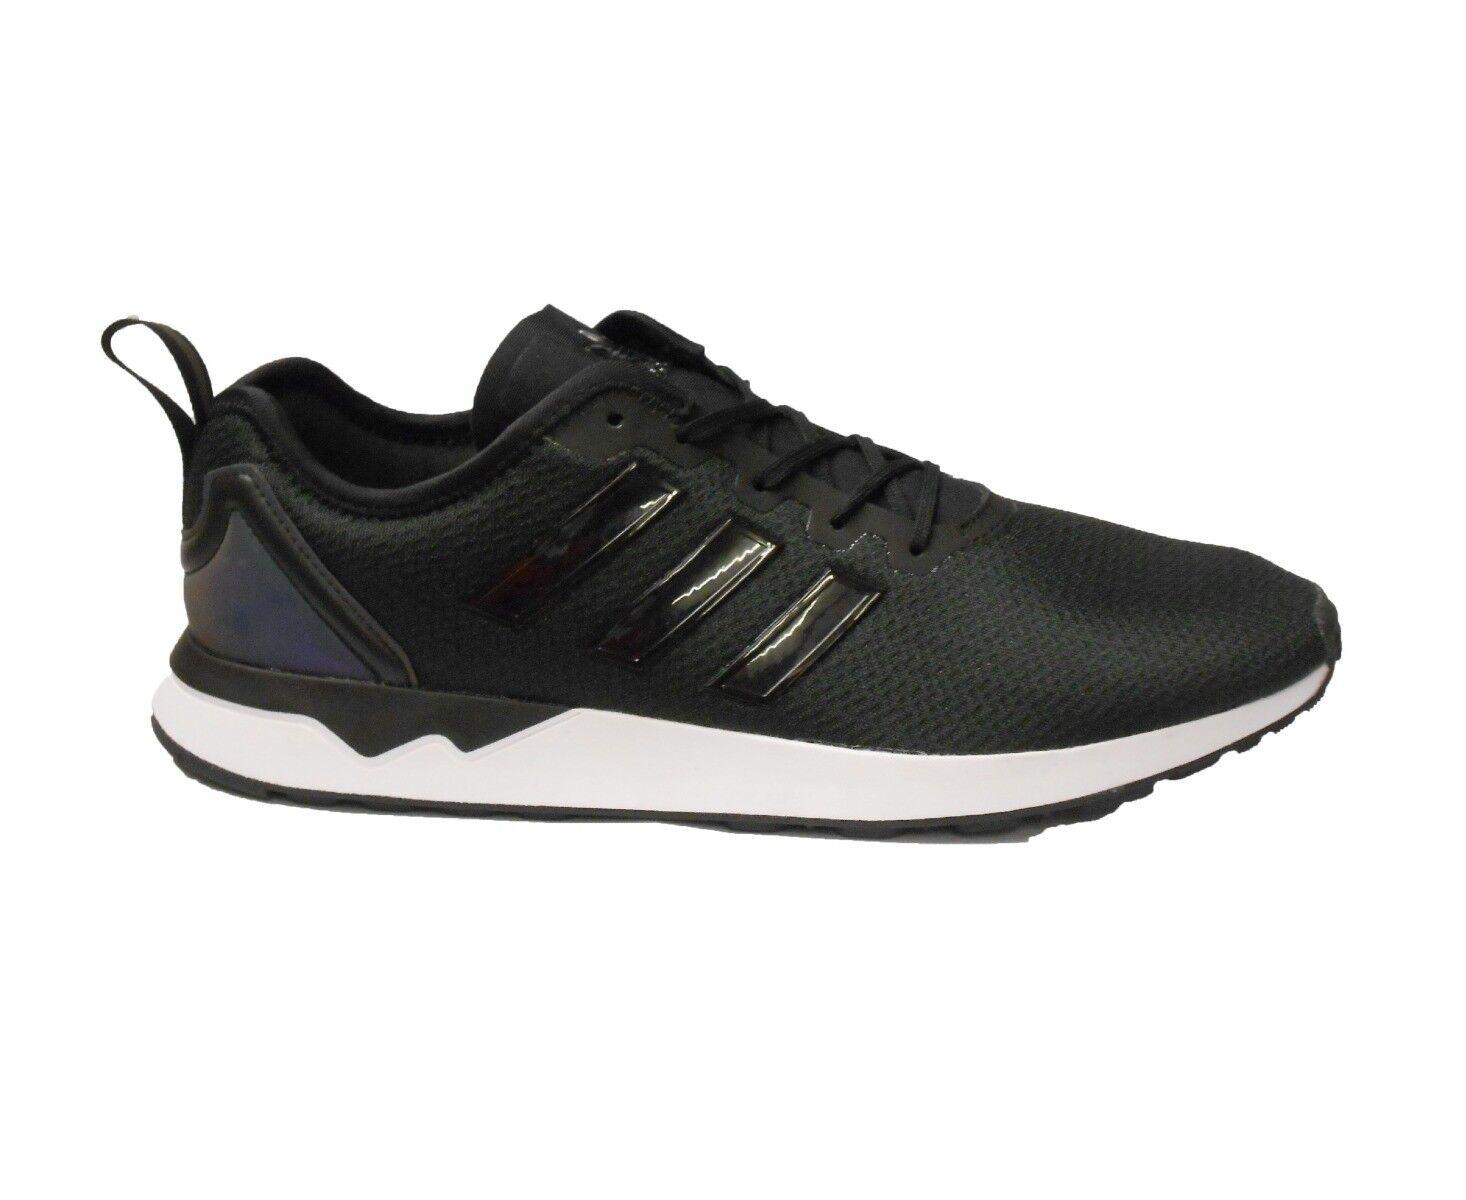 Adidas ZX Schuhe Flux ADV Herren Turnschuh Schuhe ZX schwarz UK Größe 11.5 Laufschuhe NEU c34049